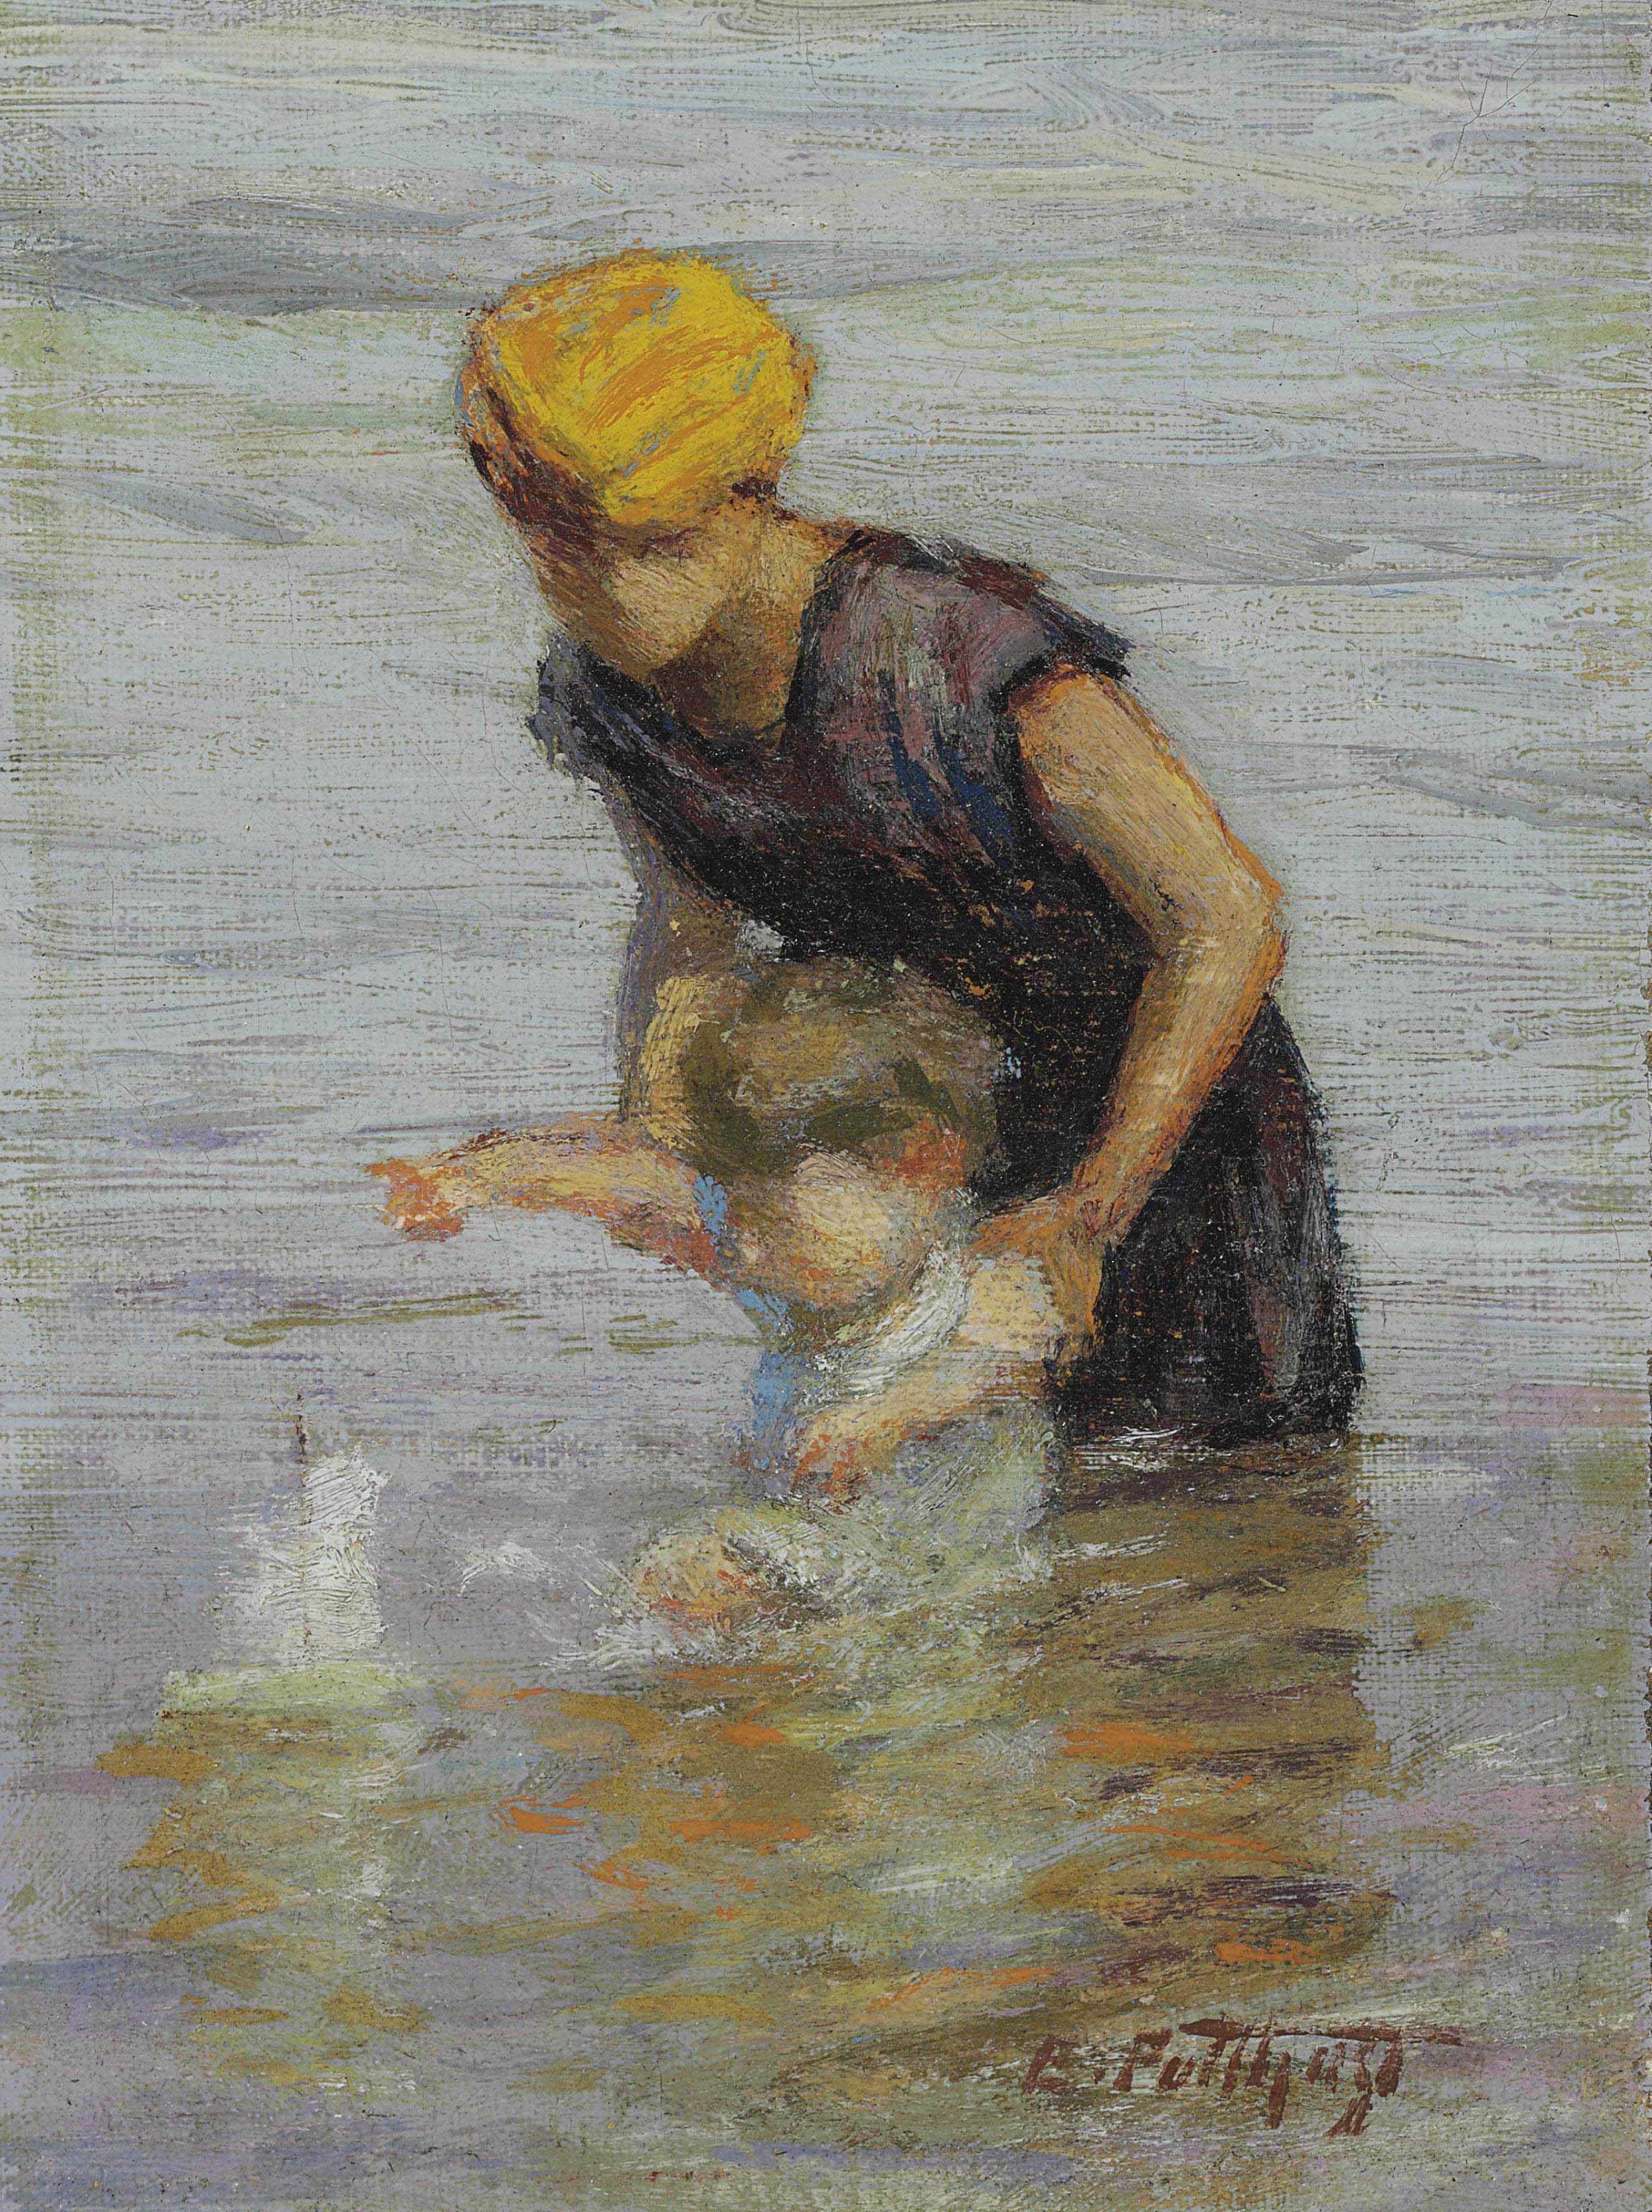 Edward Henry Potthast (1857-1927)